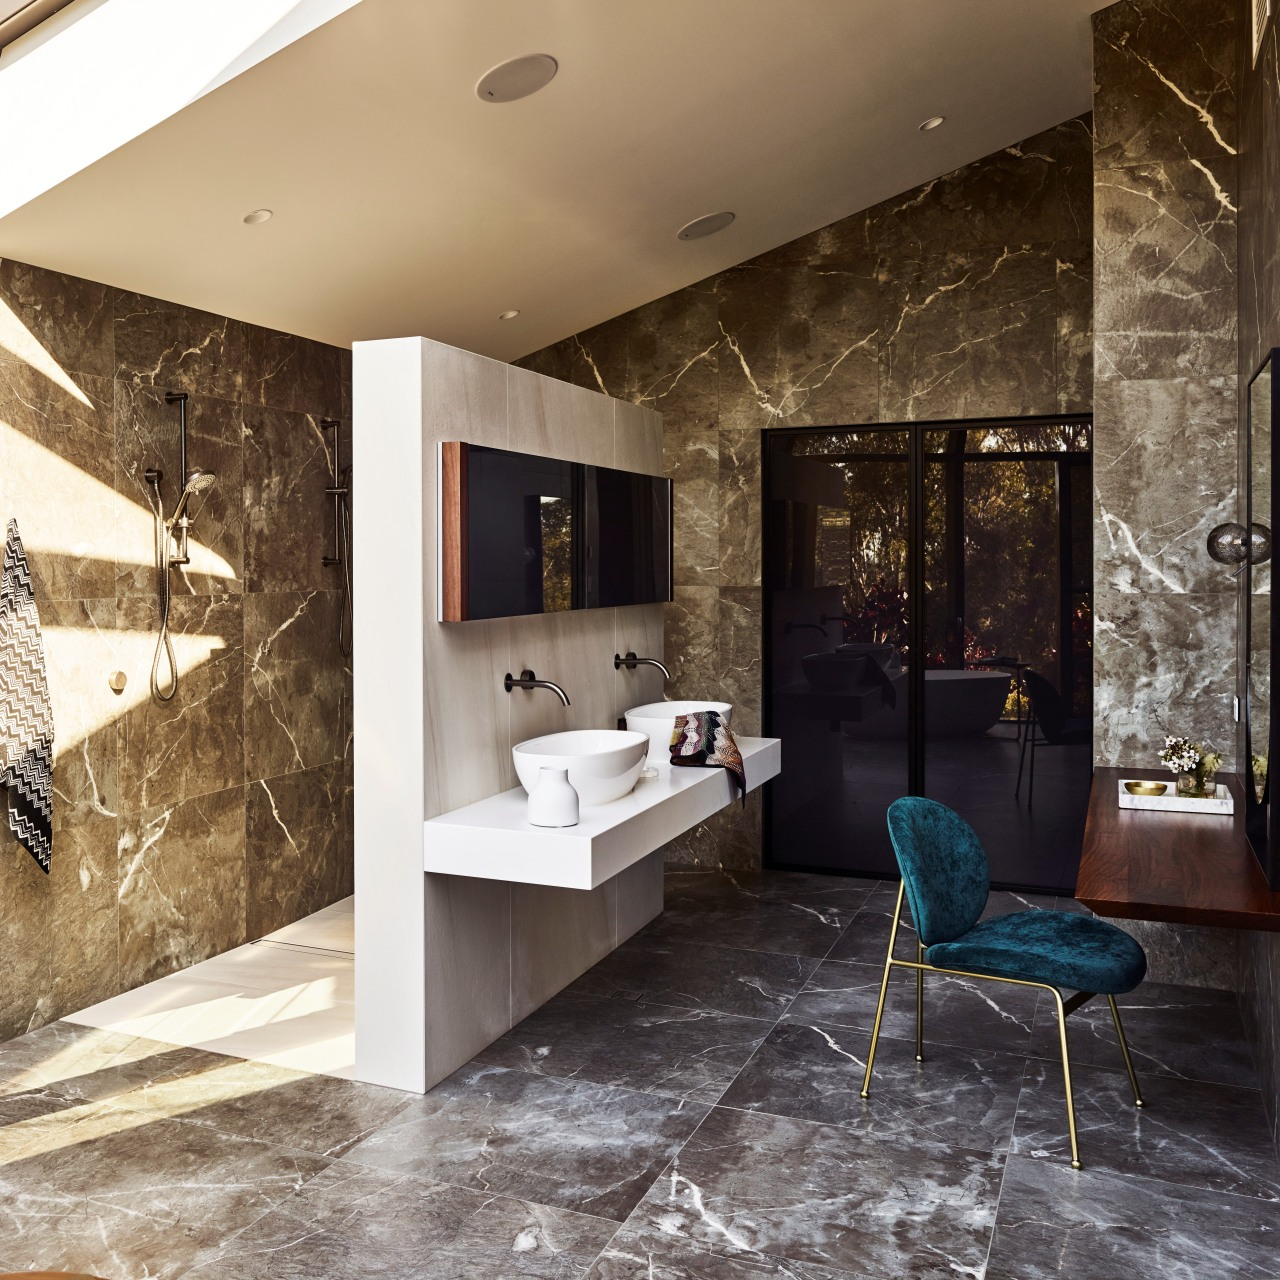 For this master ensuite, designer Darren James concealed architecture, bathroom, design, floor, flooring, furniture, interior design, lighting, tiled wall, Darren James, Bathroom, master suite